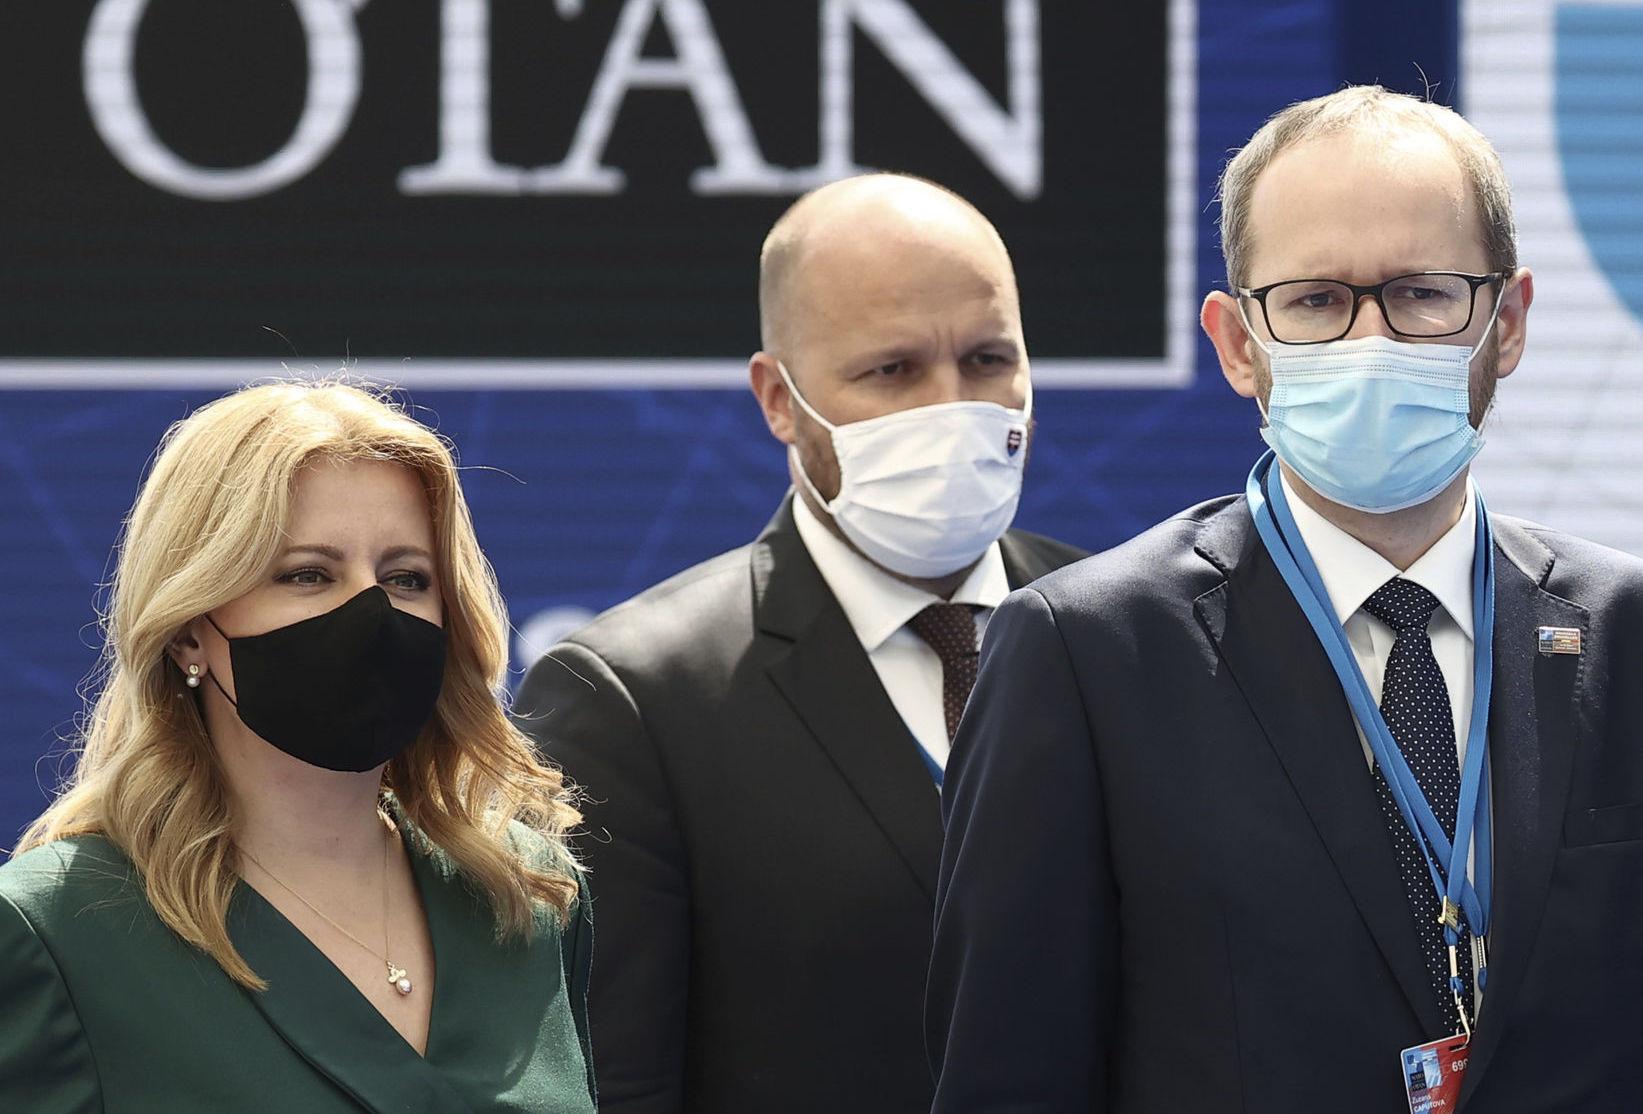 Brusel NATO Summit čaputová naď